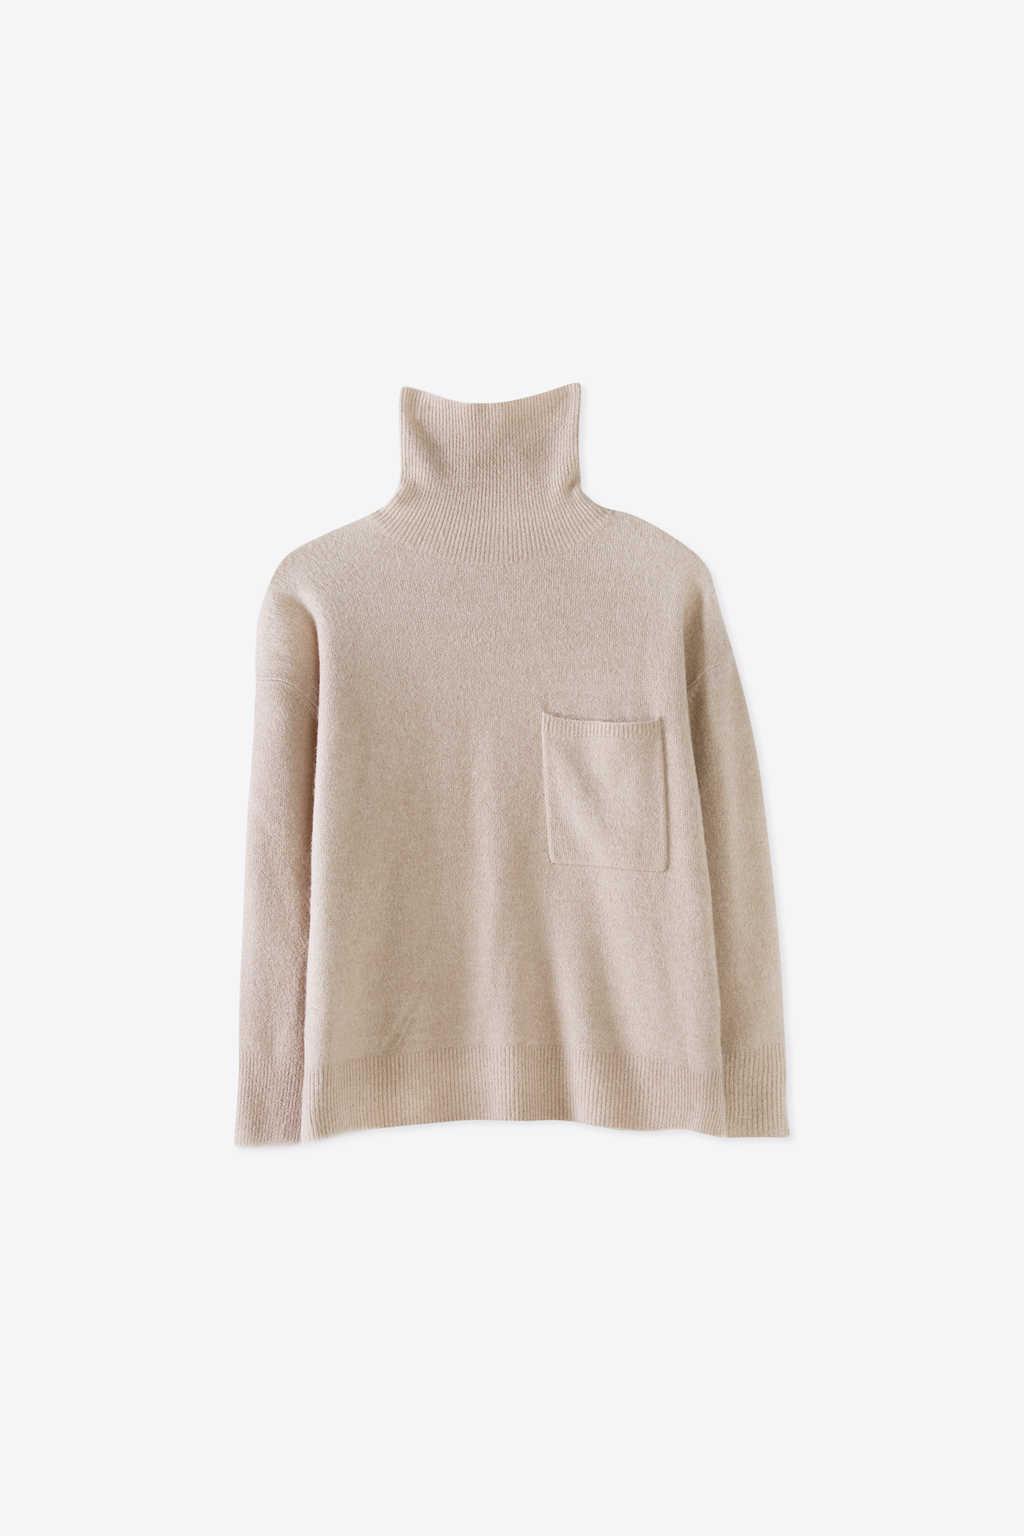 Sweater 2406 Beige 12